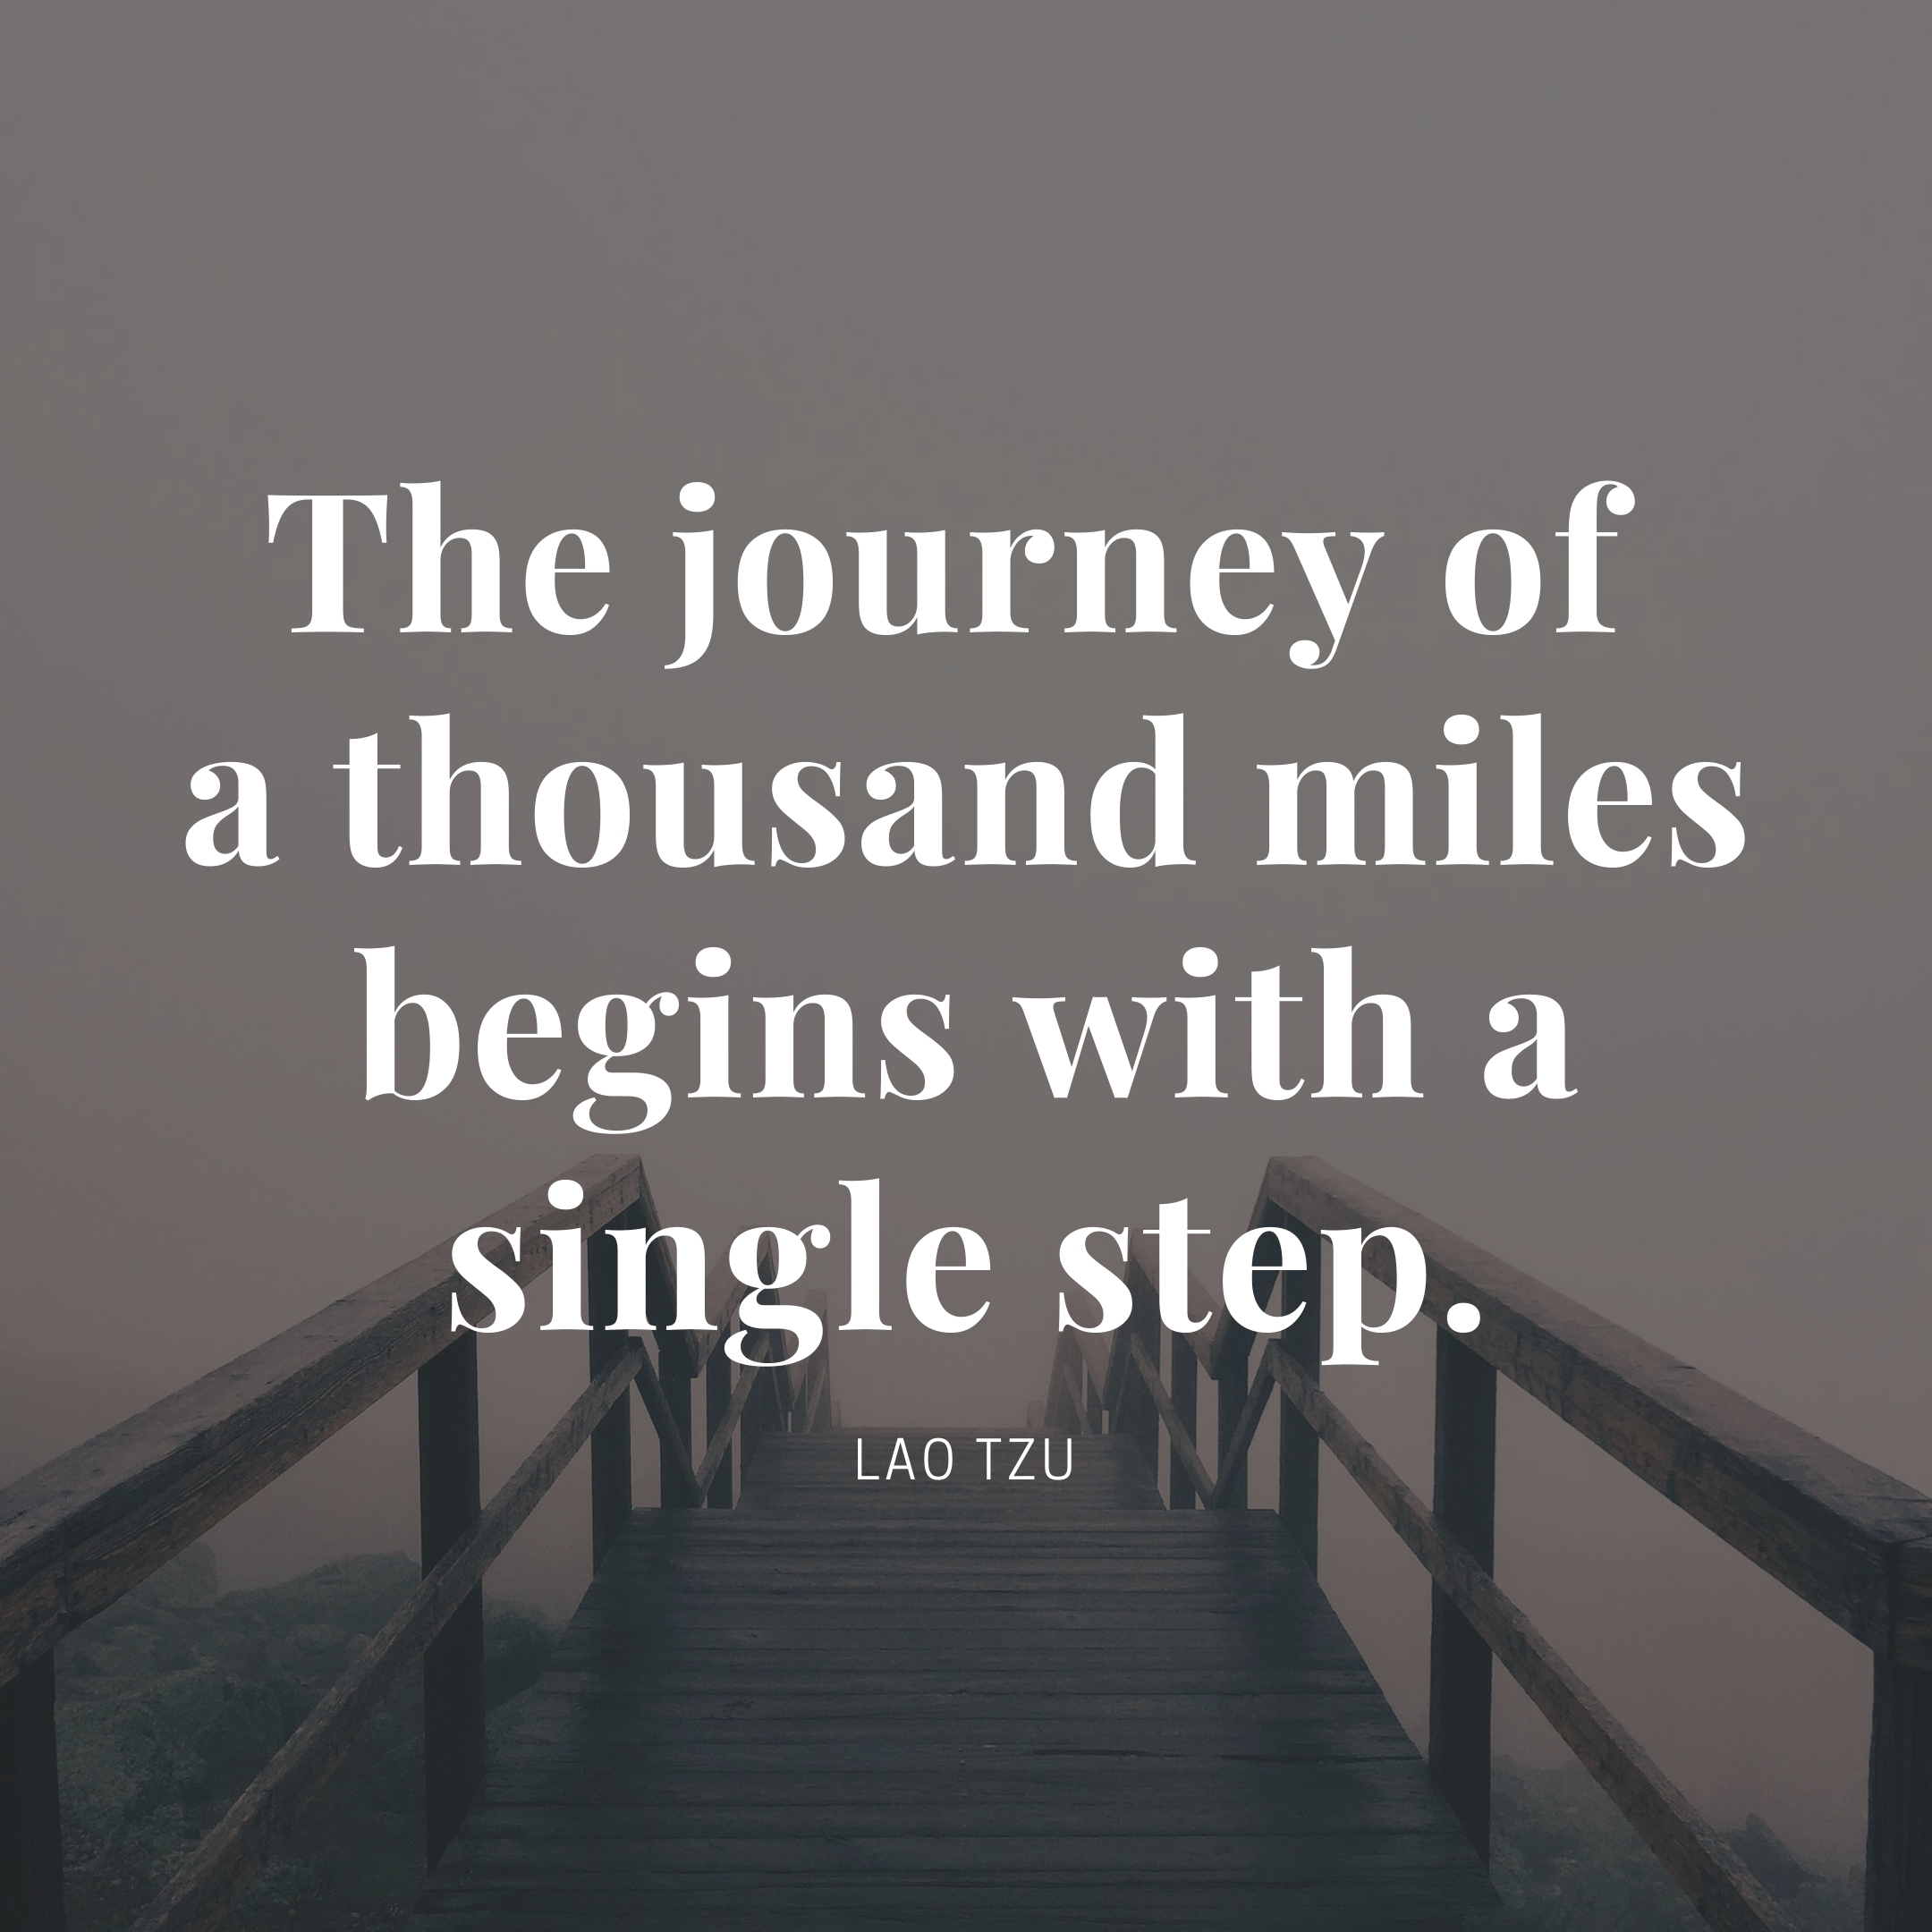 lao tzu quote | monday motivation quotes